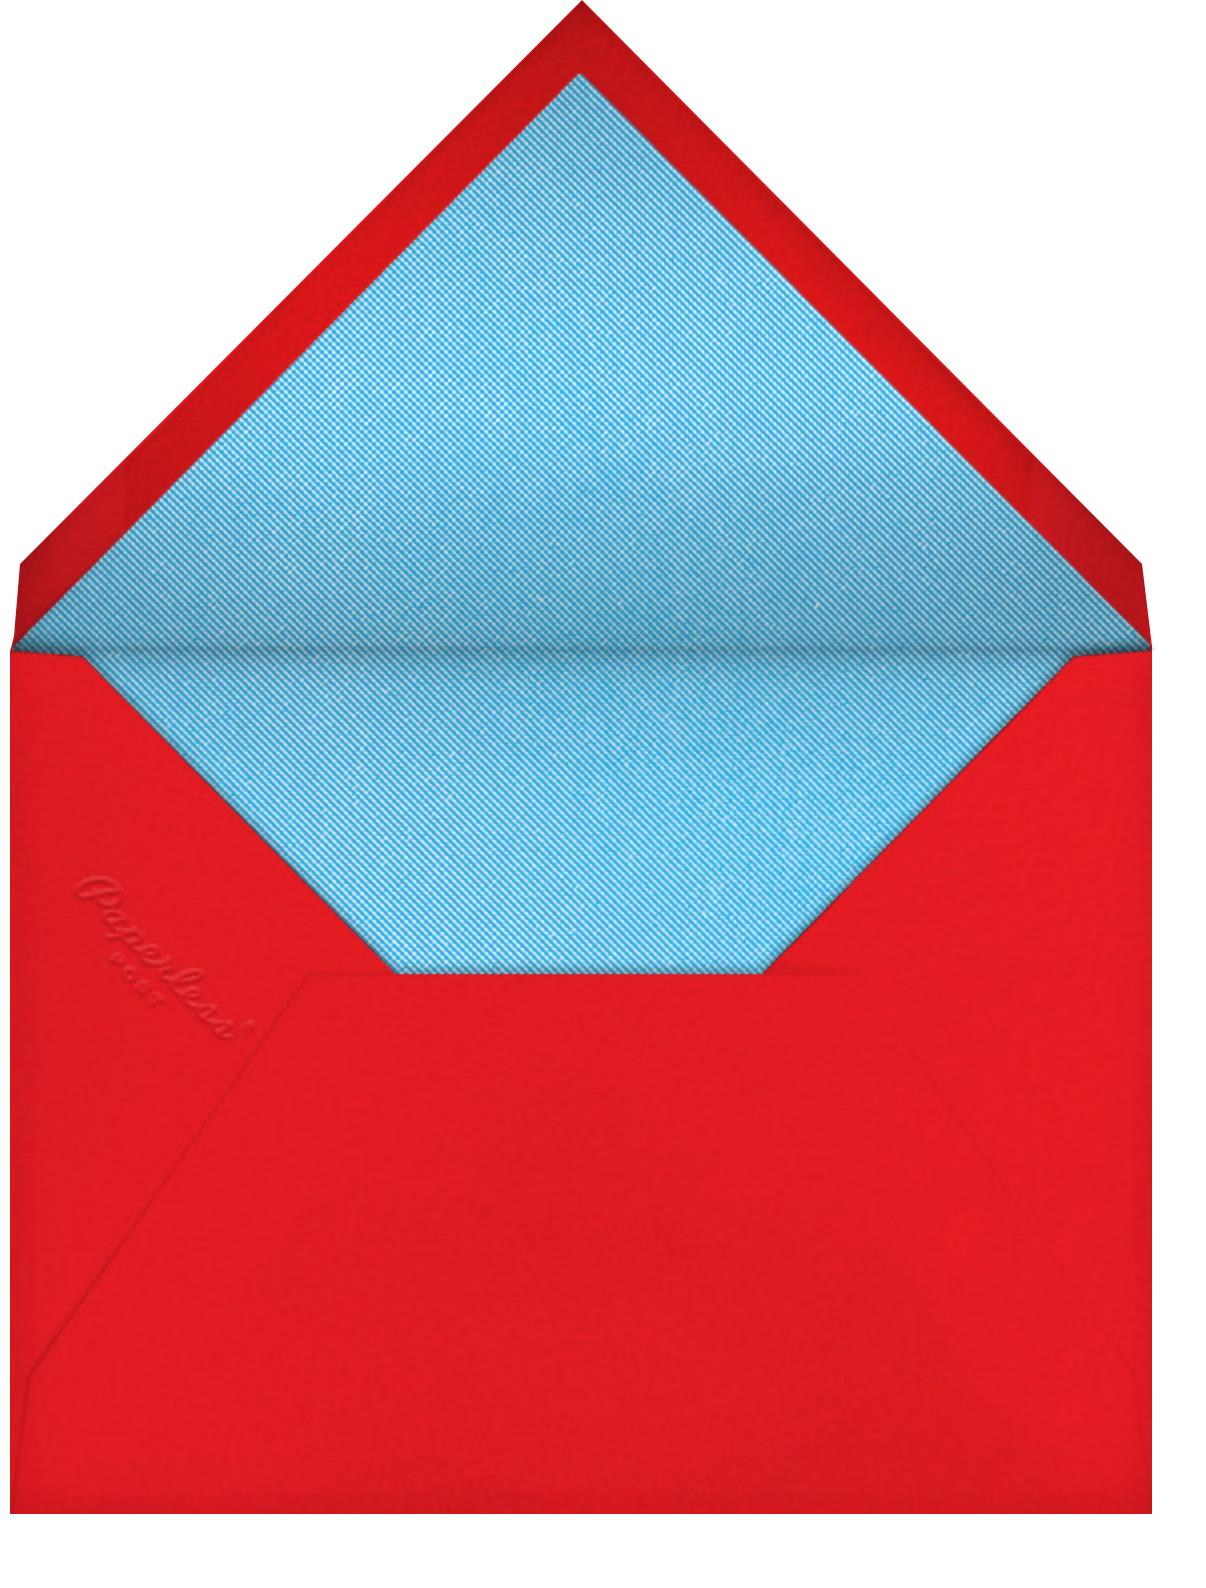 Shish-Ka-Barbecue - Paperless Post - Barbecue - envelope back